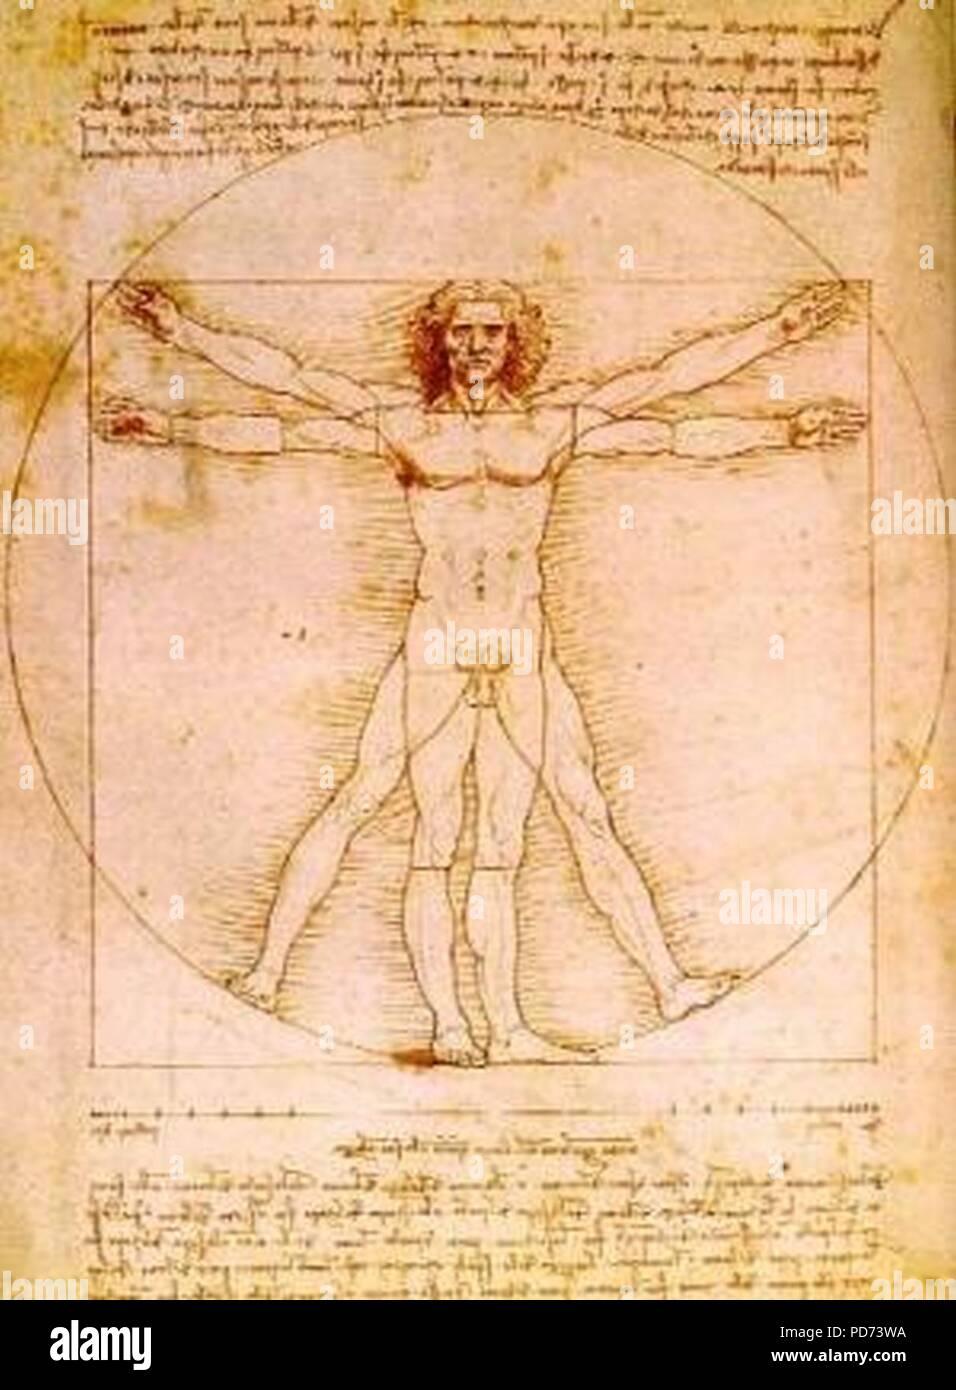 Anatomia homem Leonardo. Immagini Stock